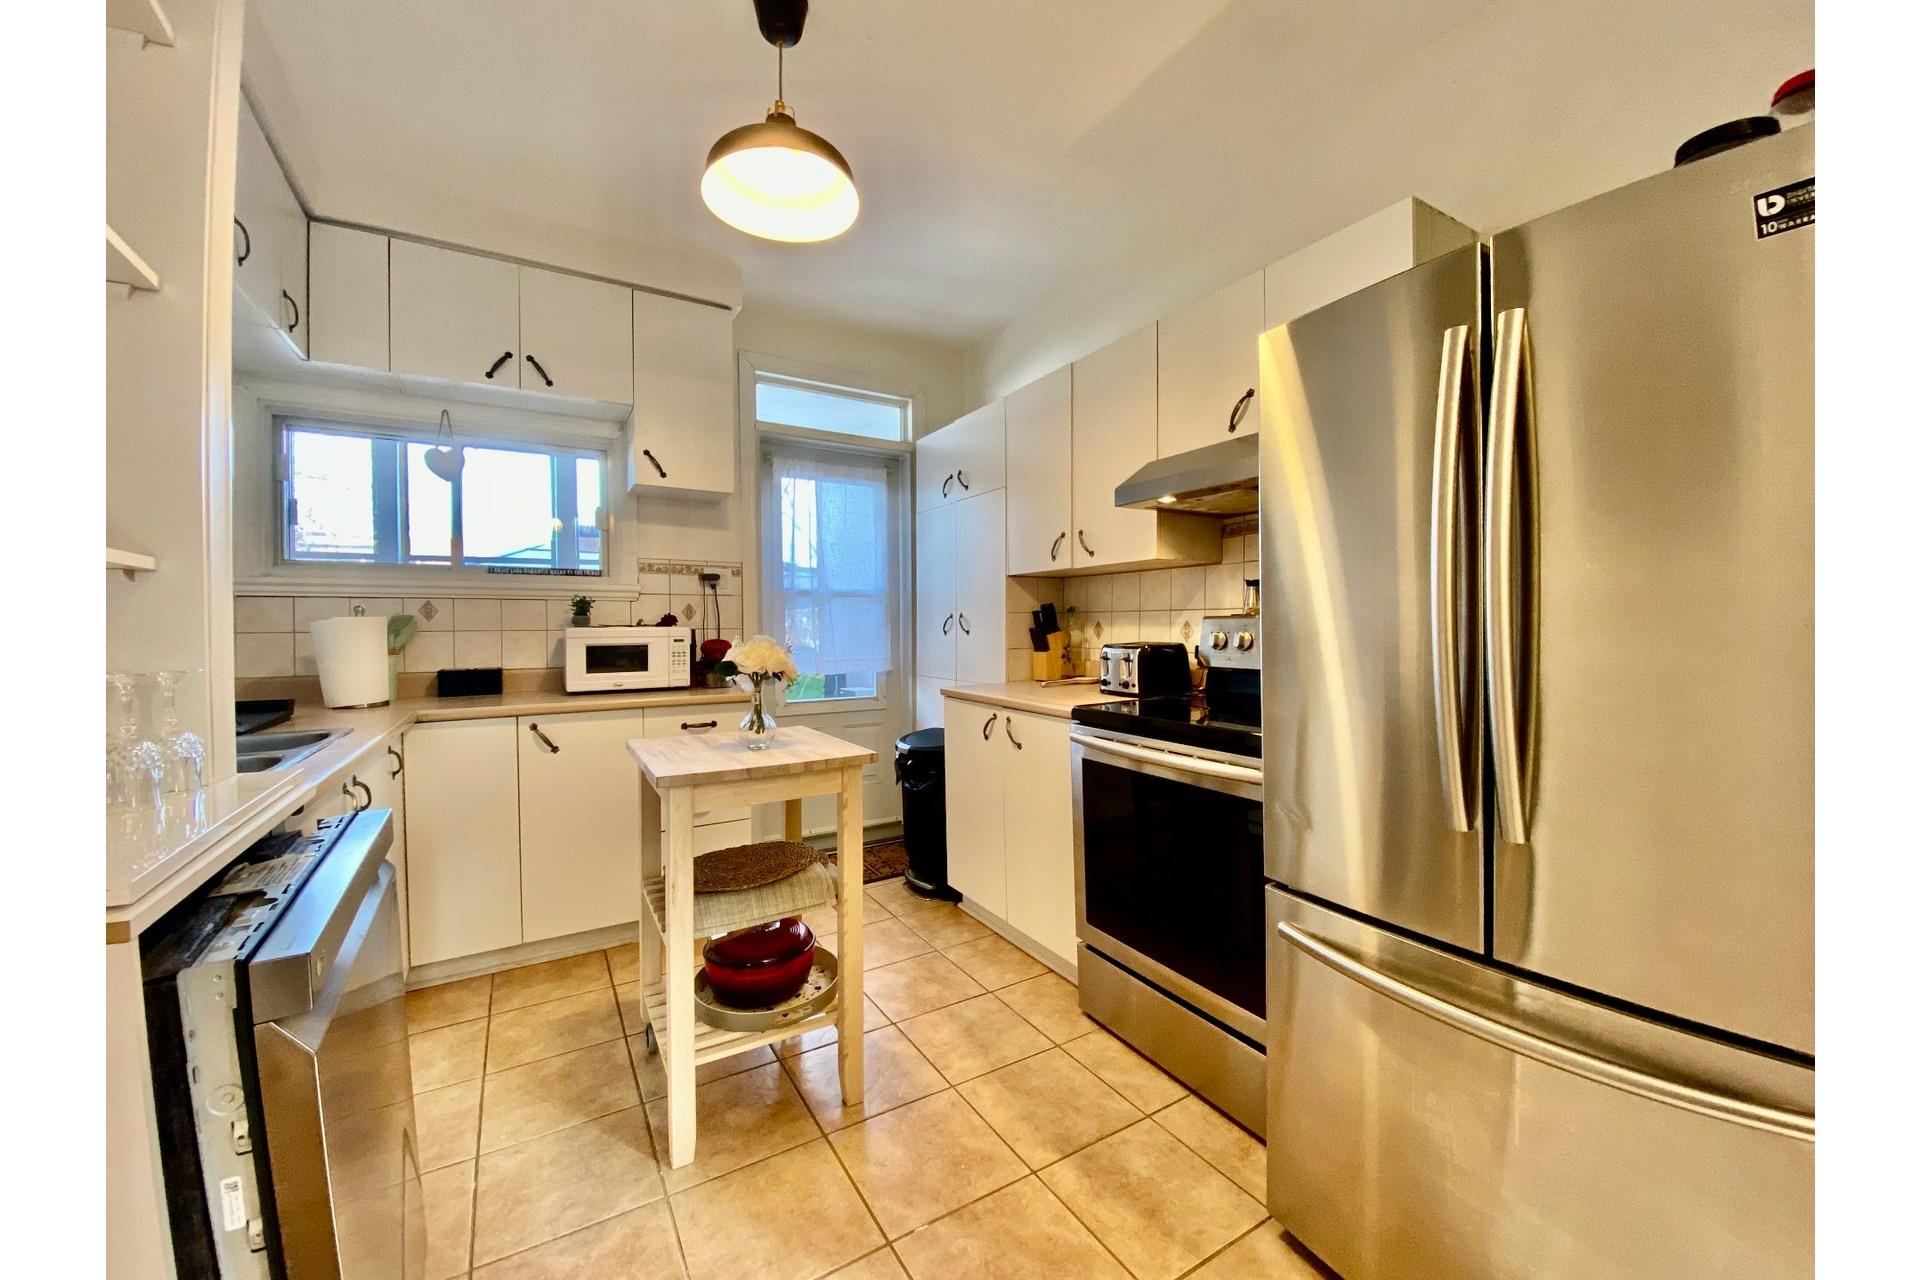 image 8 - Duplex En venta Lachine Montréal  - 6 habitaciones